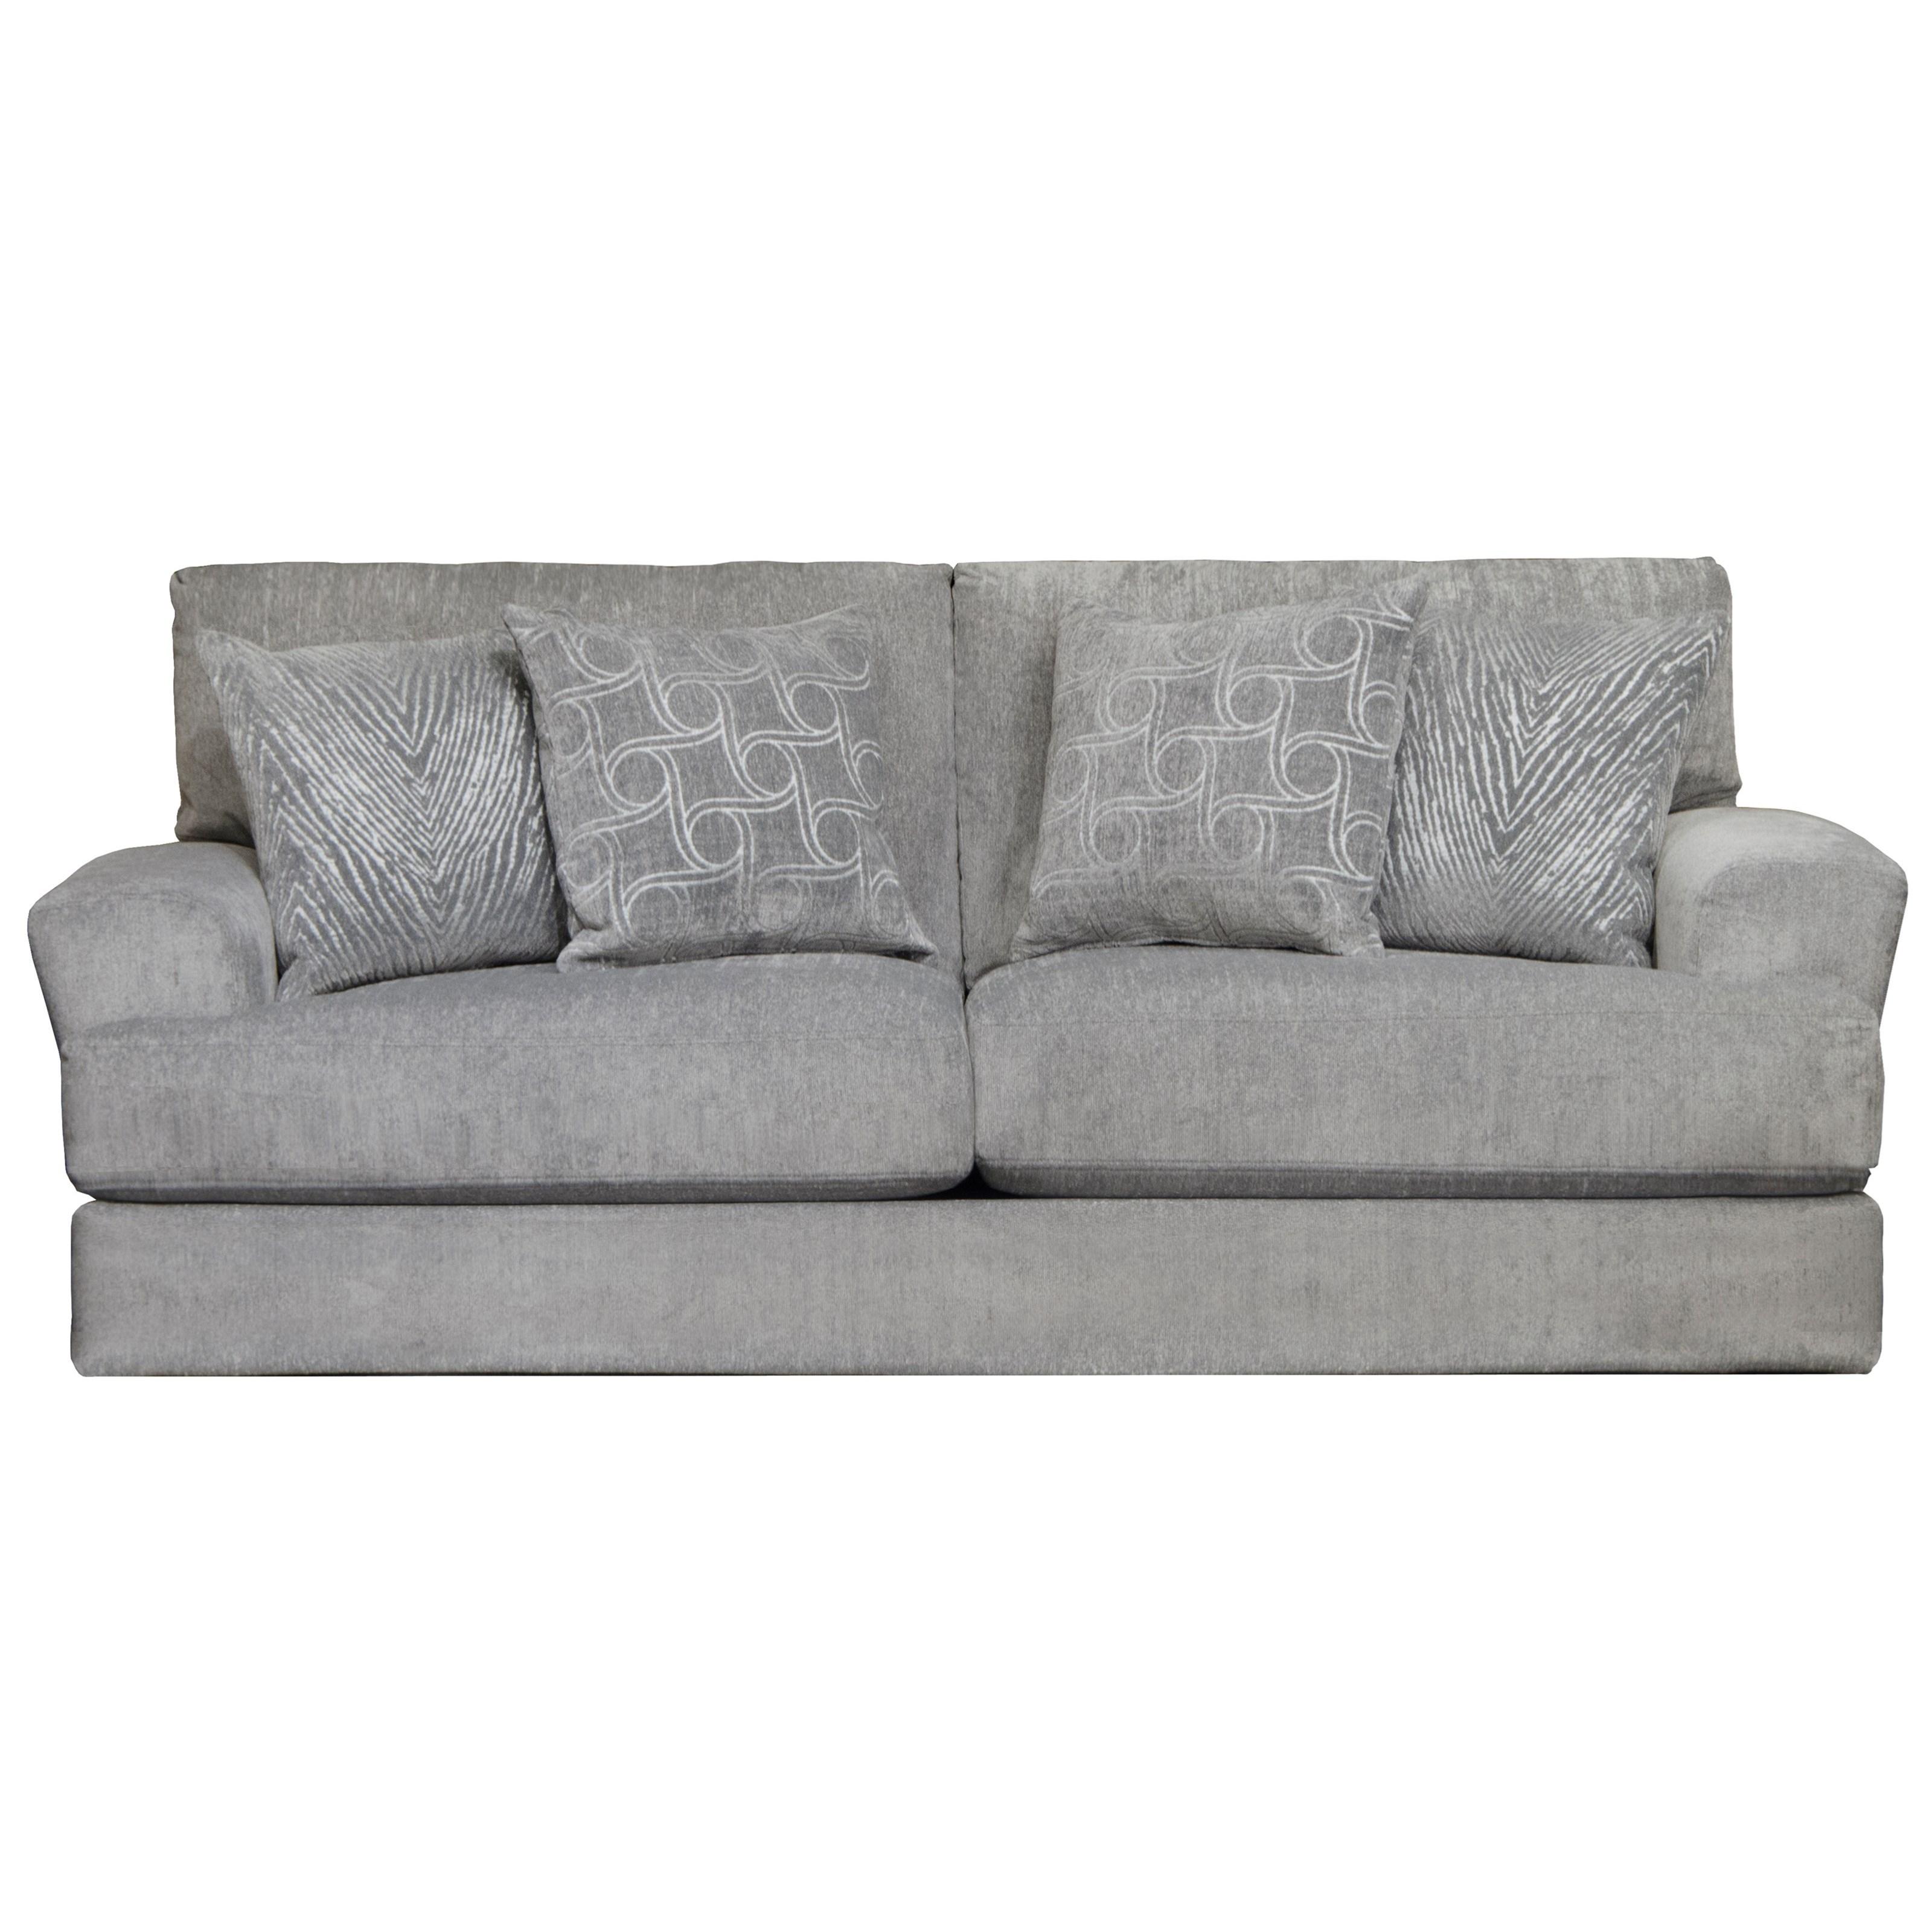 Lamar Sofa by Jackson Furniture at Furniture Fair - North Carolina